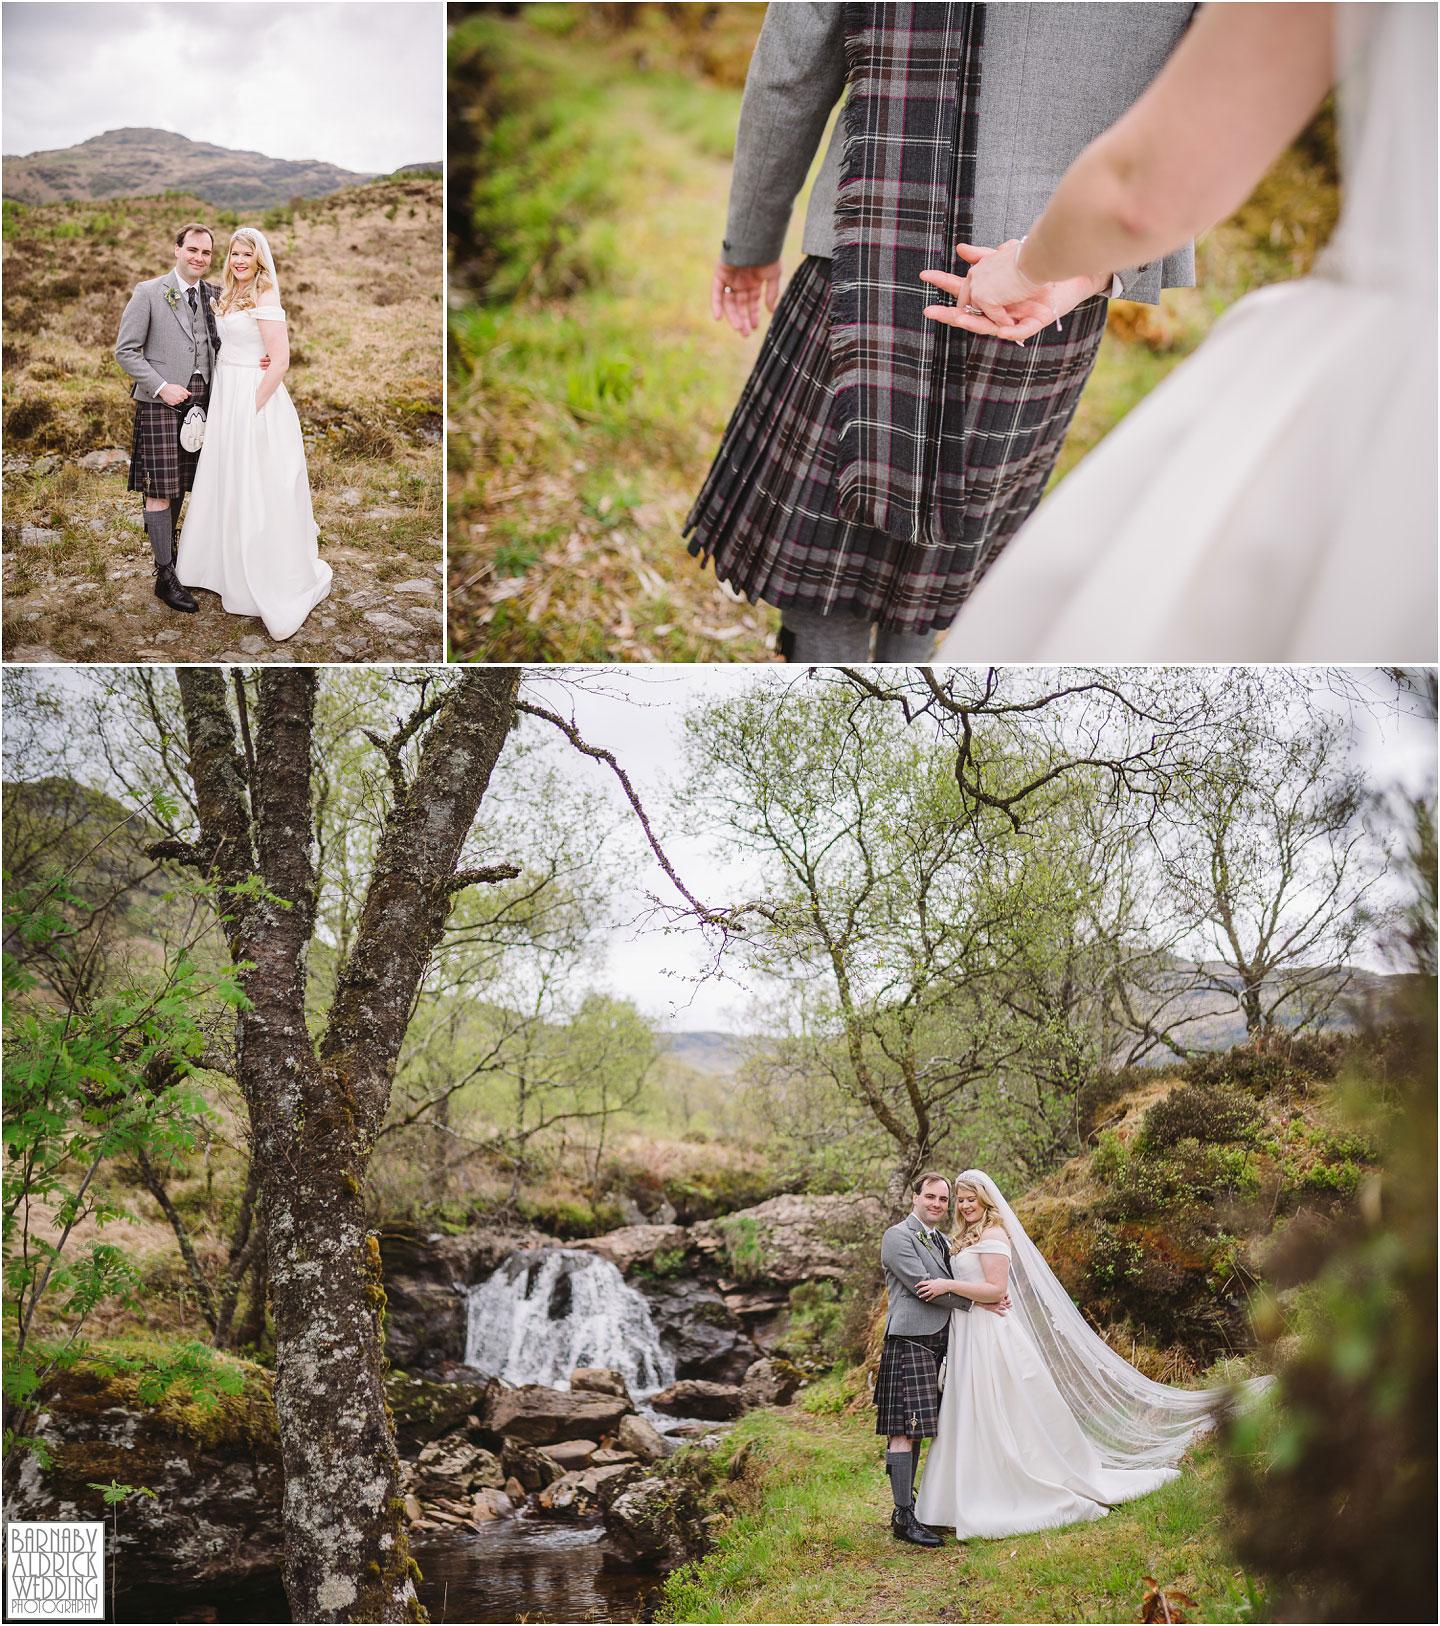 Scottish Waterfall wedding photo at Carrick Castle Estate Lodge Wedding, Loch Goil Wedding photos, Argyll Forest Park Wedding Scotland, Scottish Wedding, Scottish Lockdown Wedding, Scottish Wedding